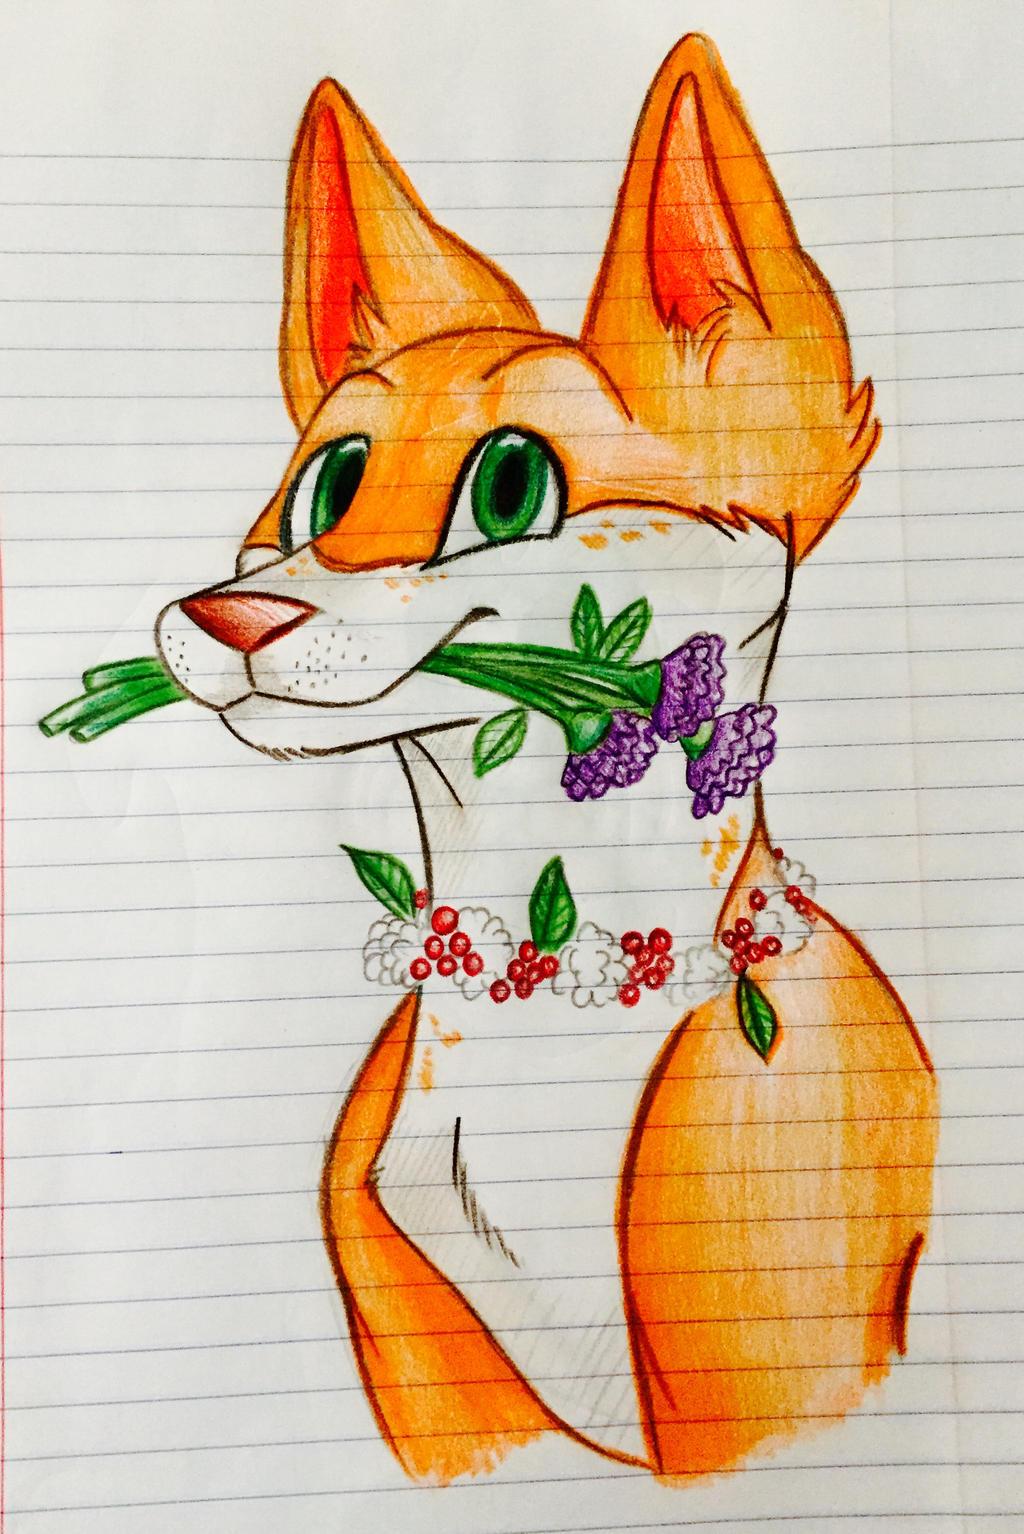 Flower Pup by veeeester400